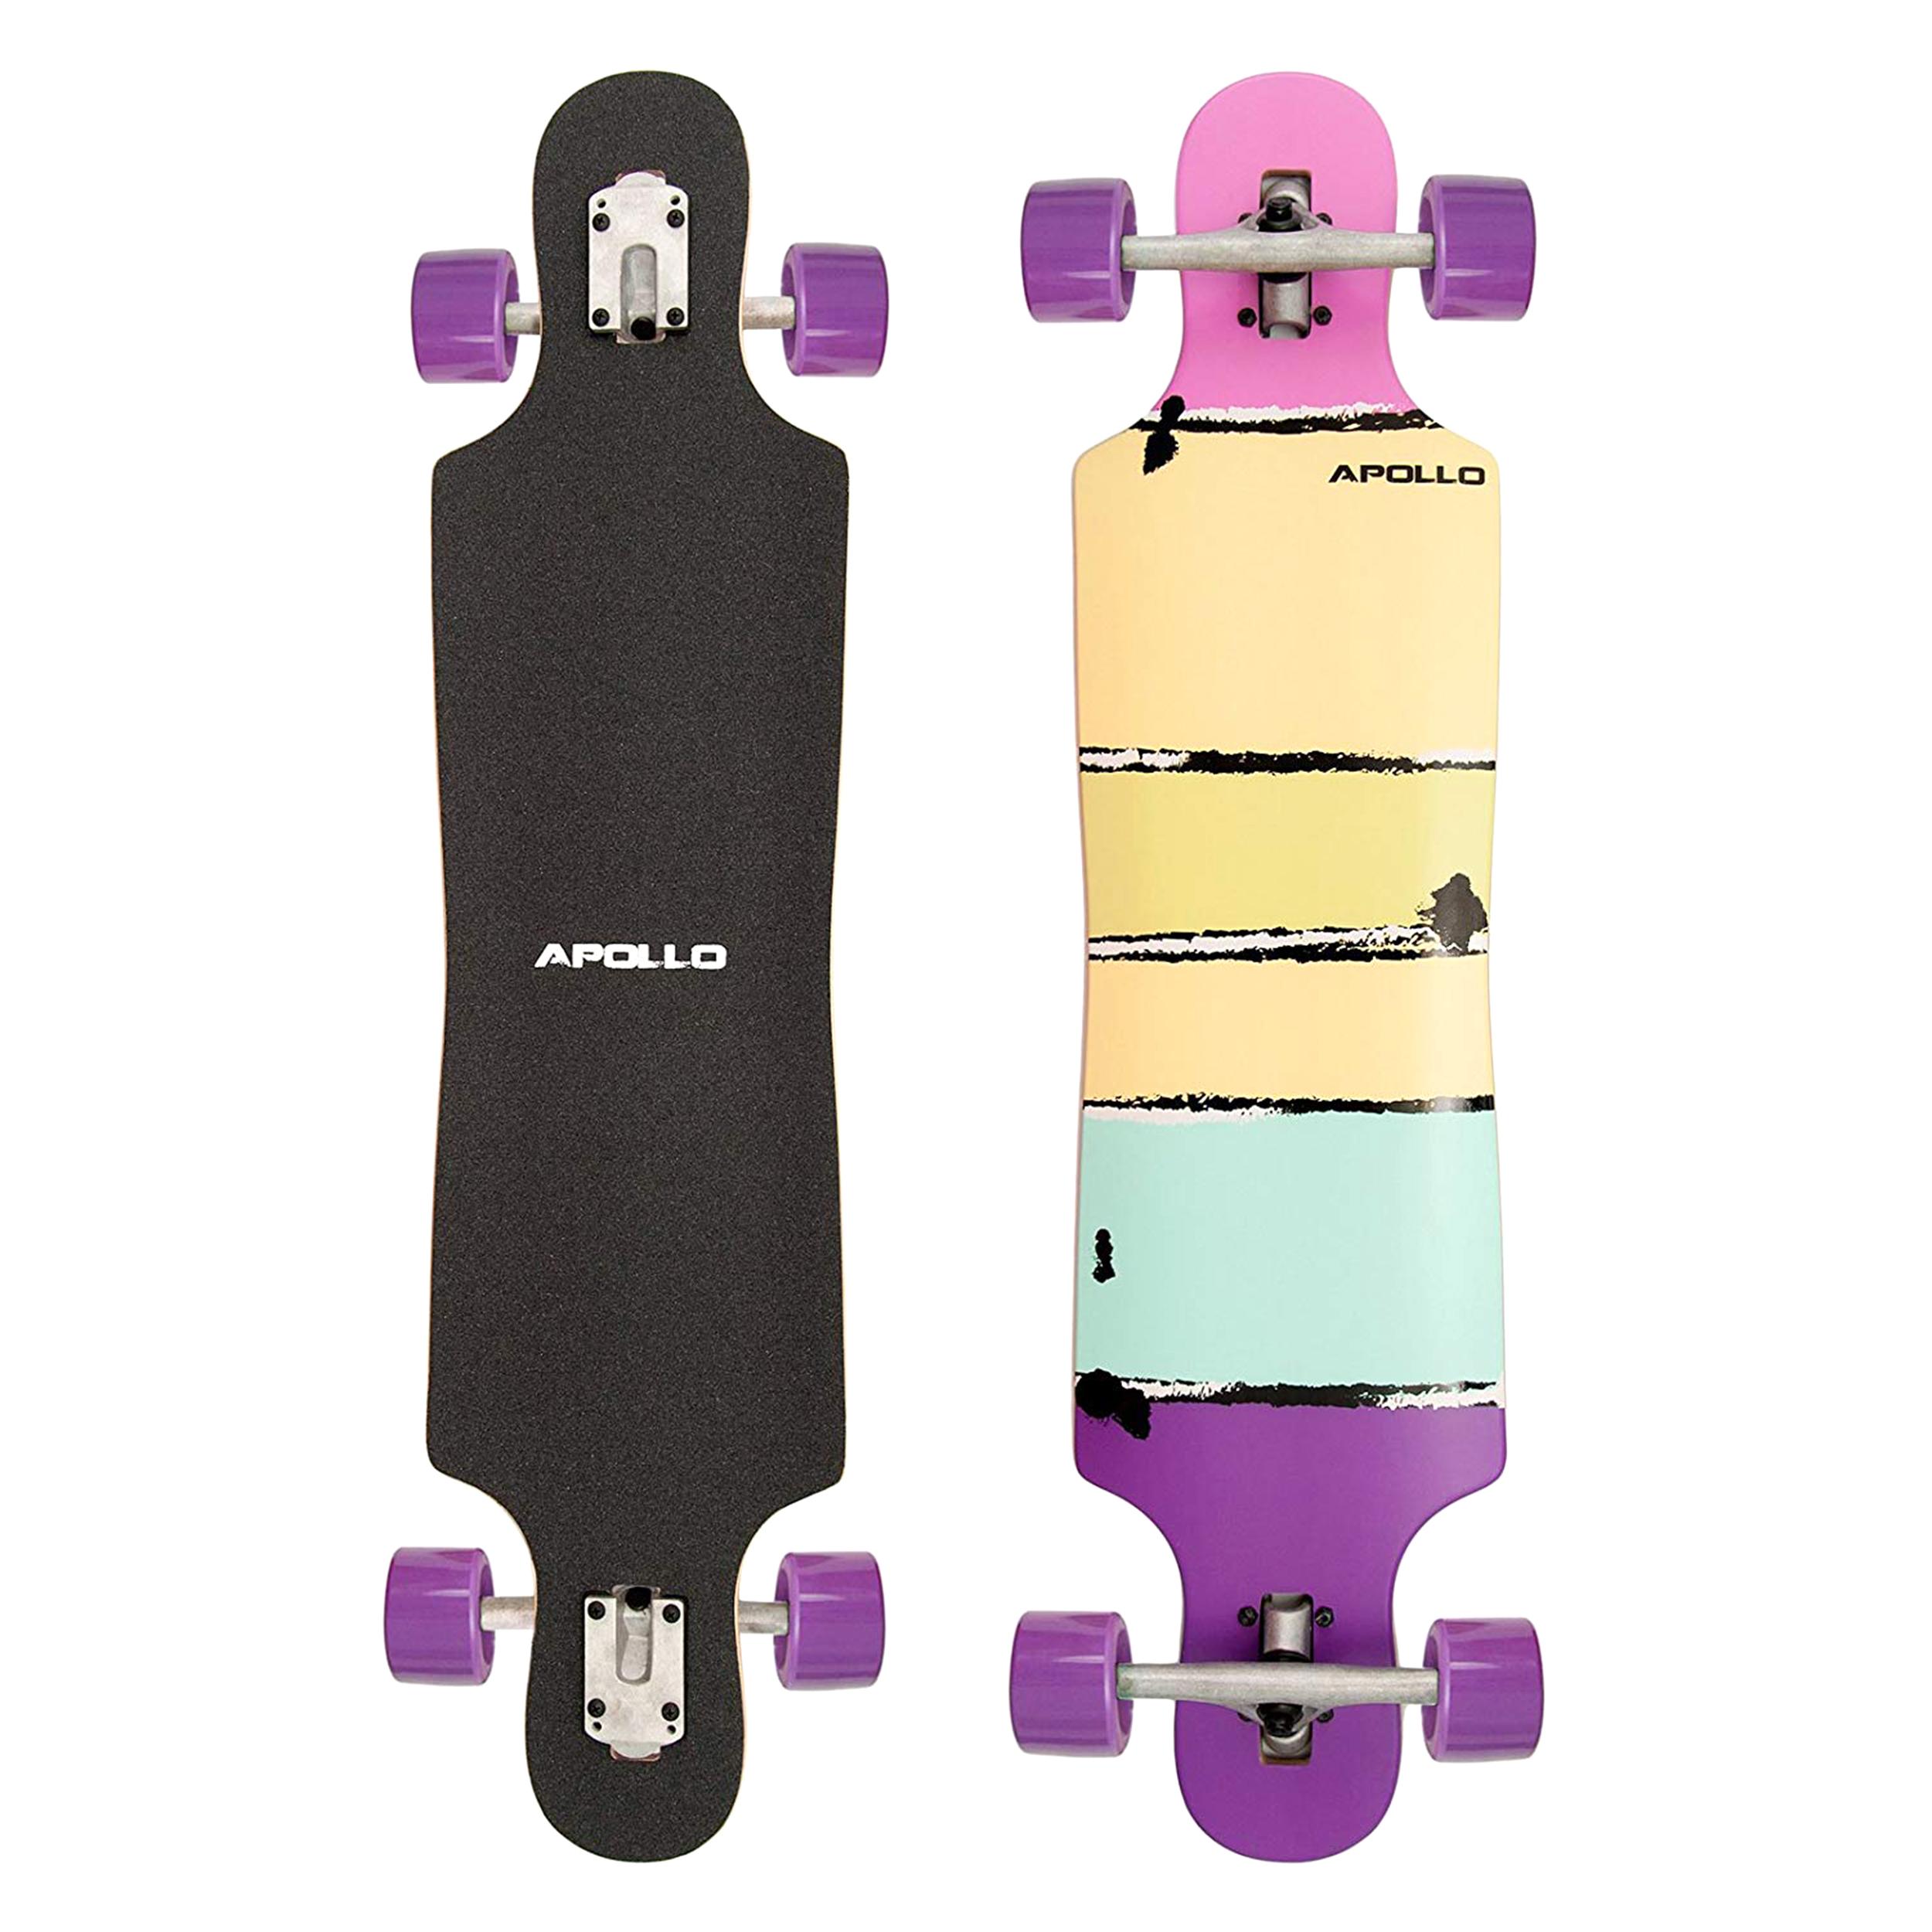 Apollo Papeete Purple Colour - DT Longboard 39 (99cm)